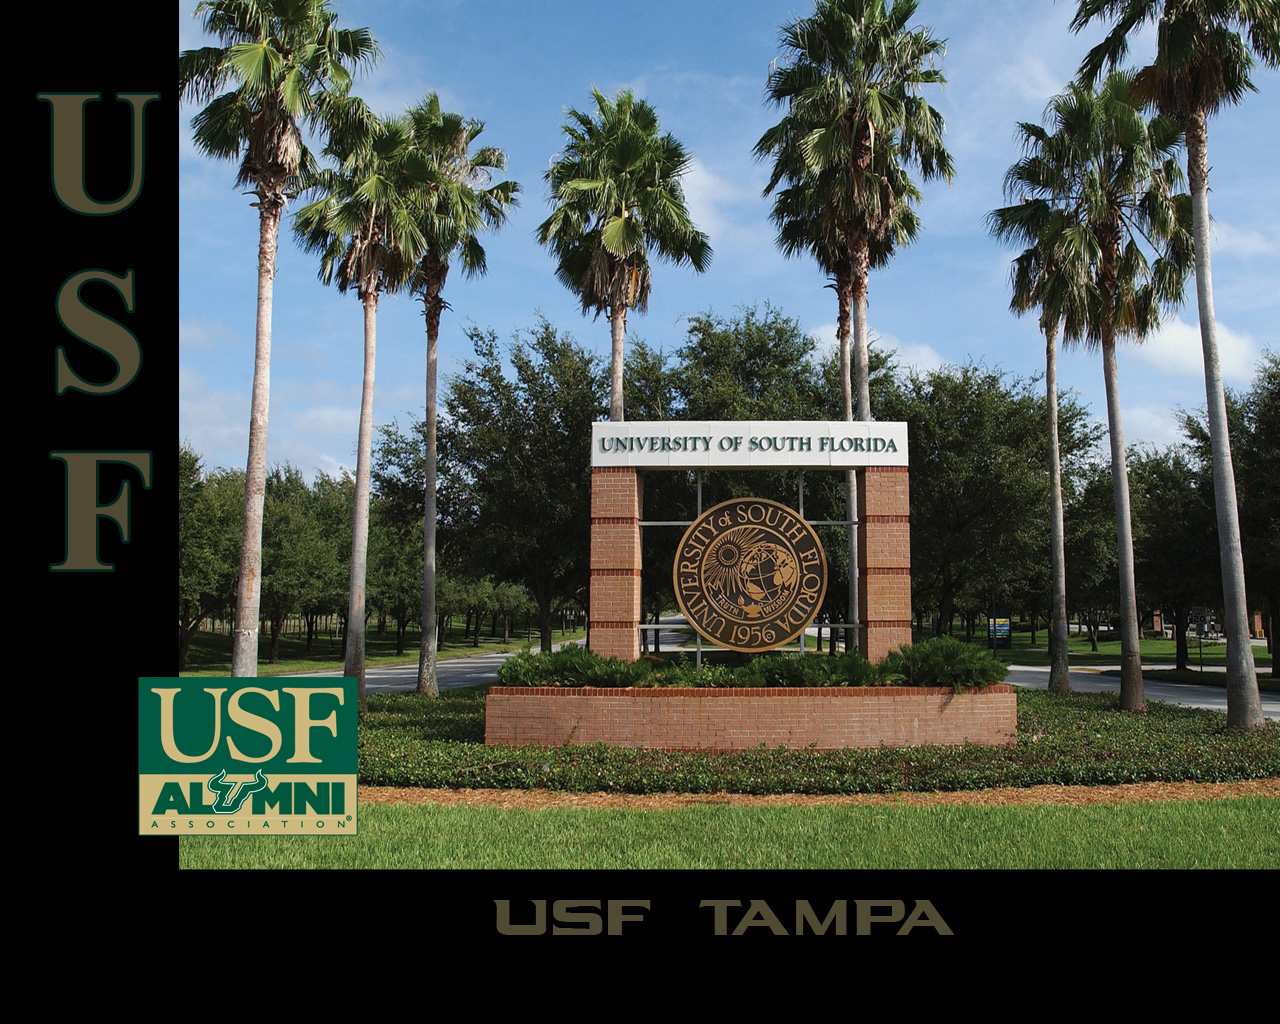 USF Alumni - USF Wallpaper